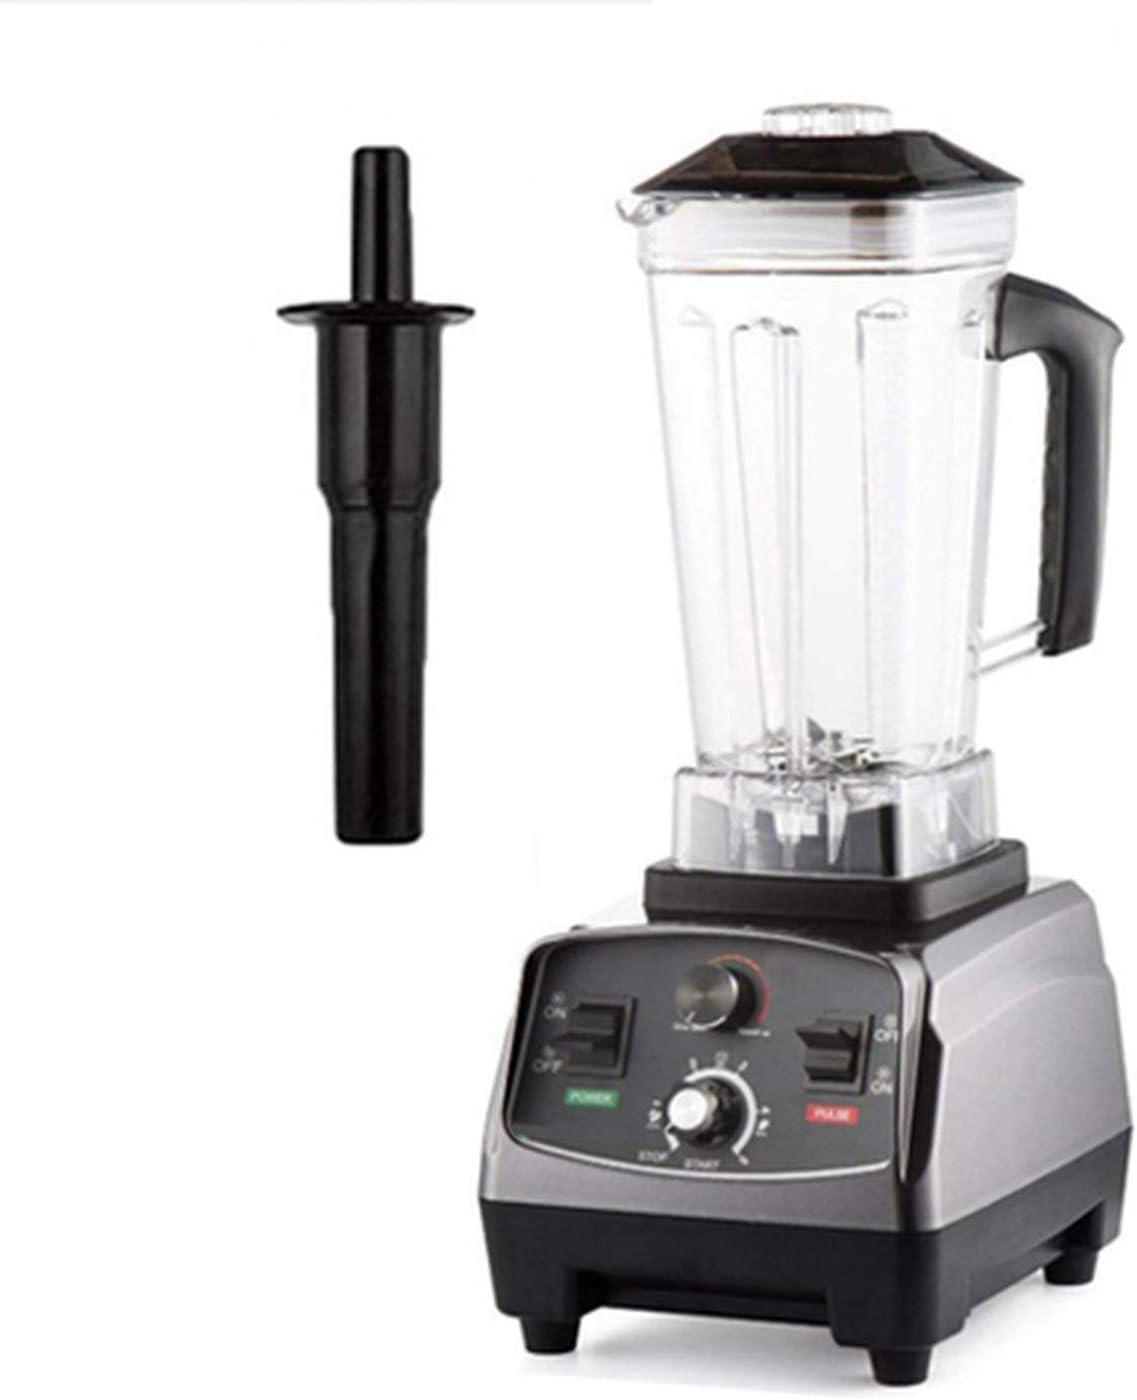 Heavy Duty Automatic Timer Blender Commercial Grade Mixer Juicer 3Hp 2200W Fruit Food Processor Ice Smoothies 2L Jar,Titanium Grey,Uk Plug